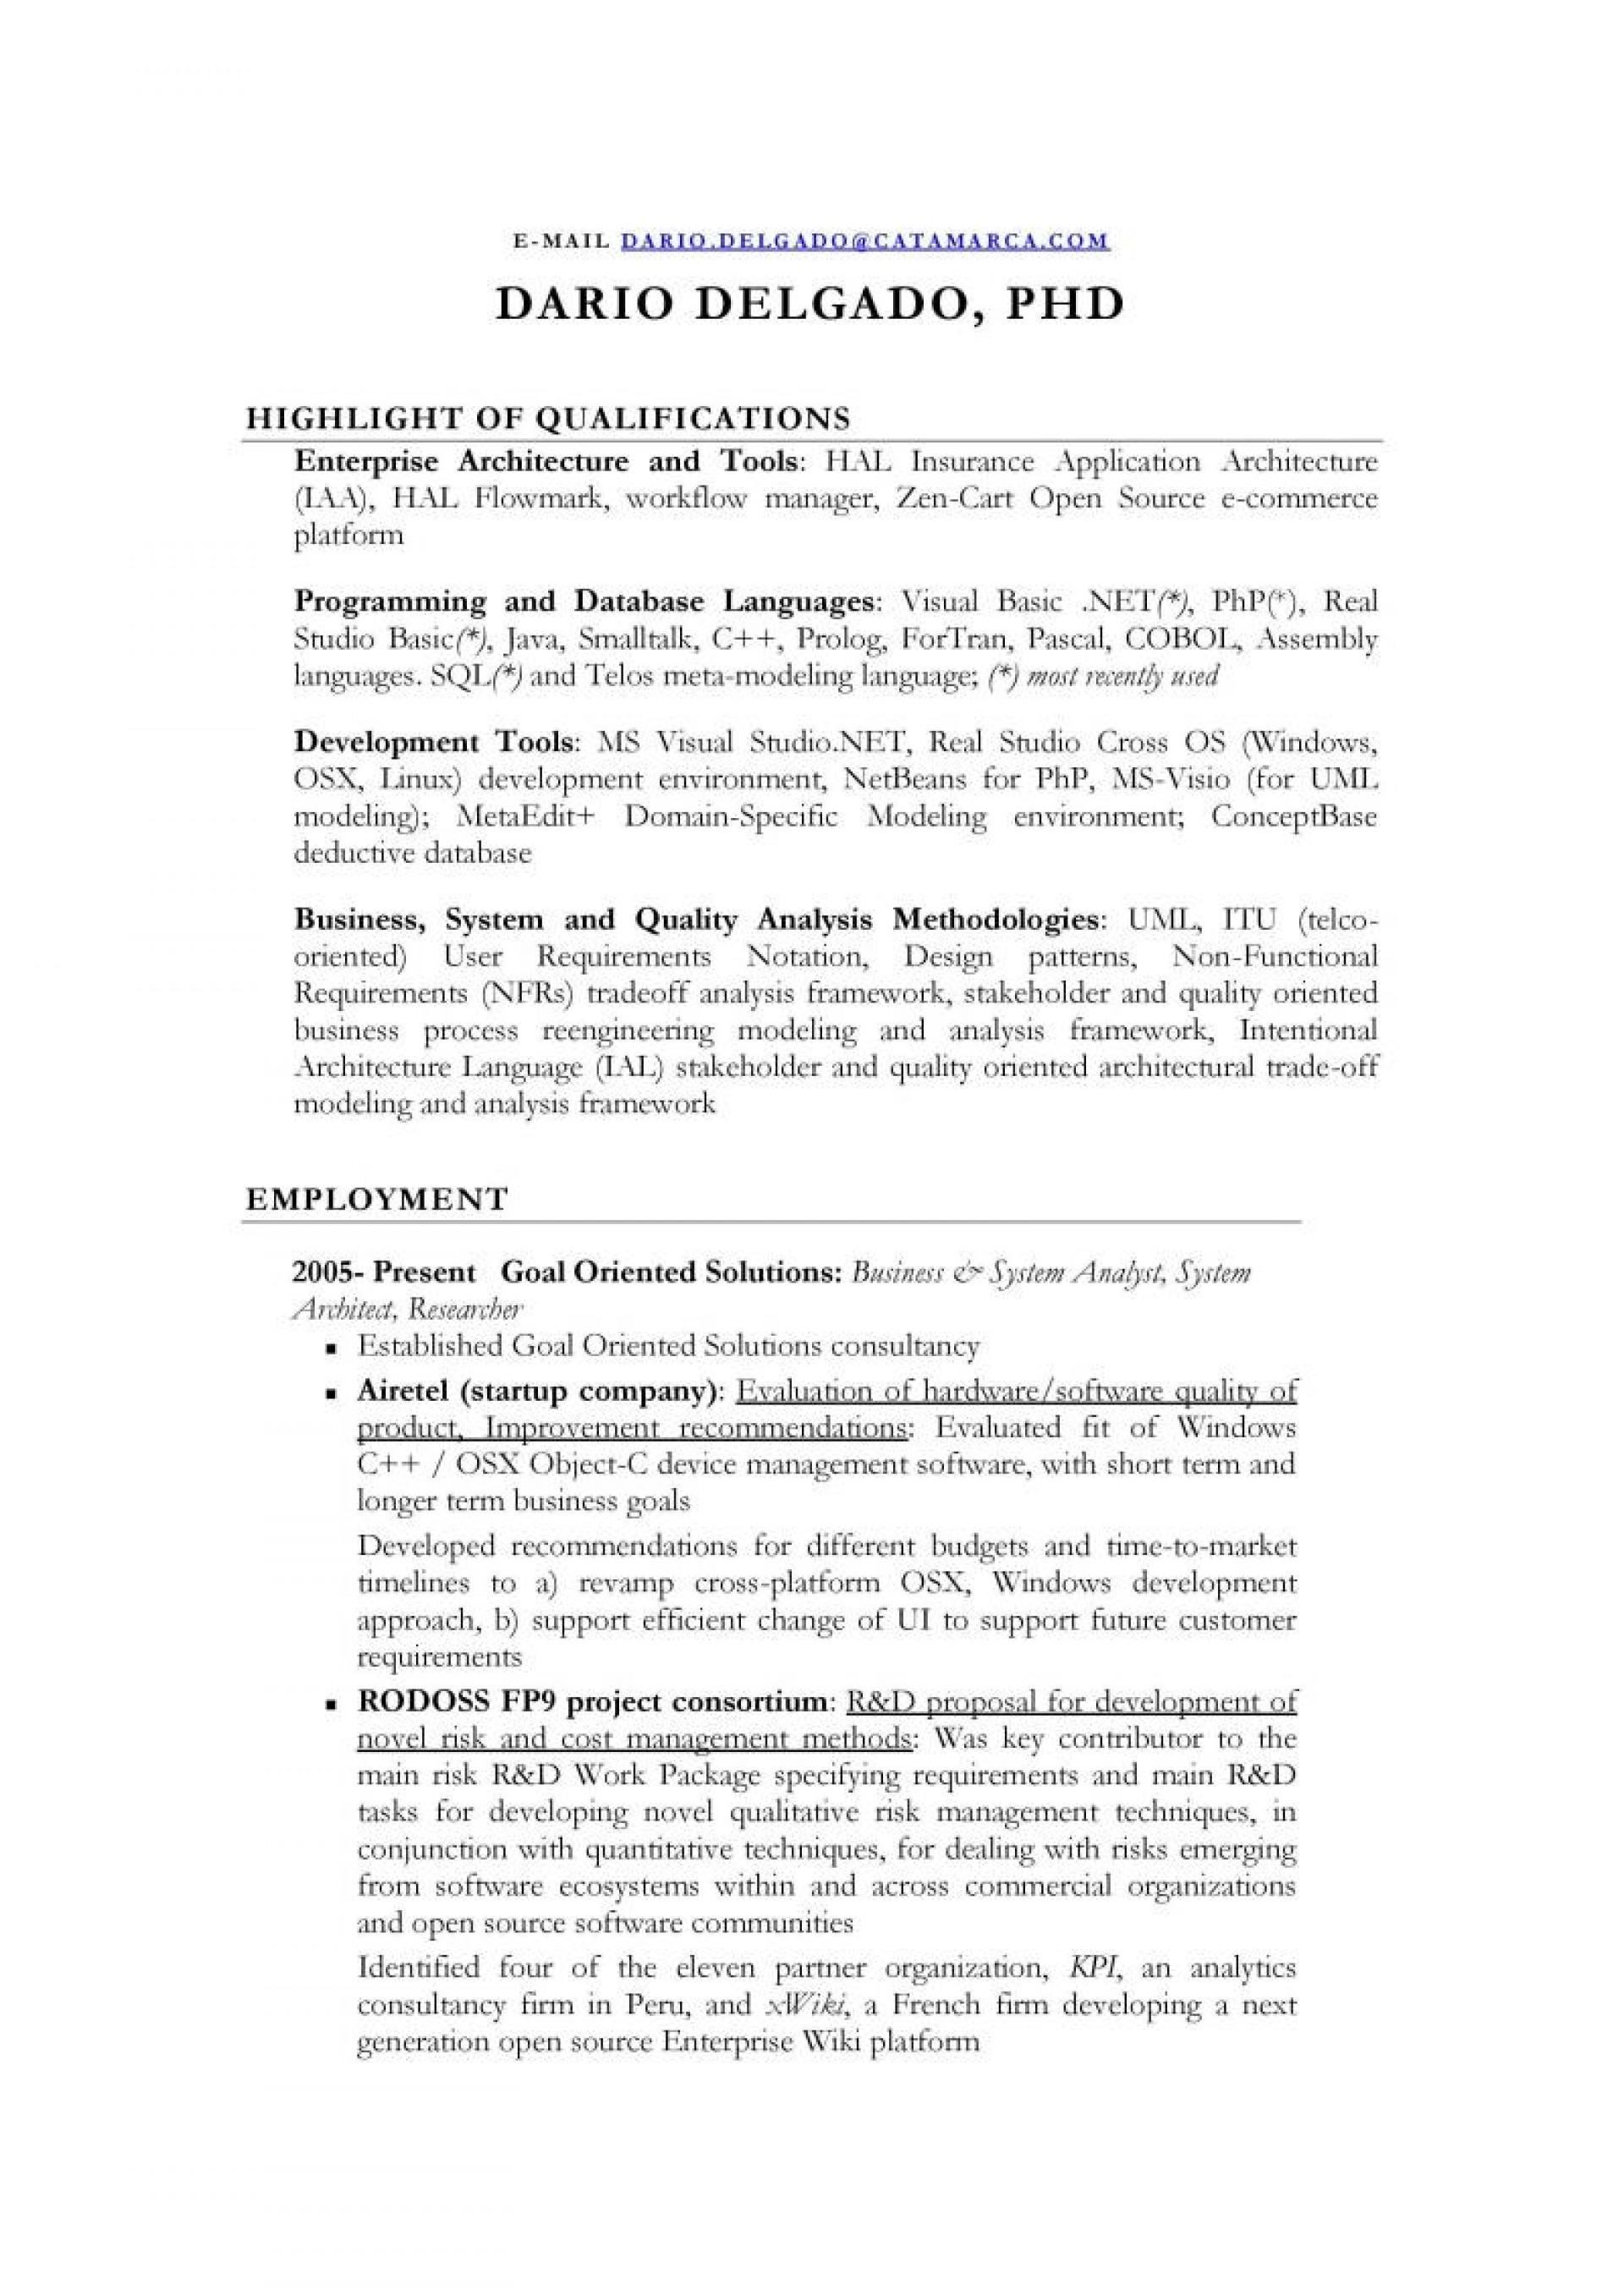 016 Sample Resume Net Developer Unique Essays Apply Texas Professional School Essay Example Of Developerresize8002c1131ssl1 Topic Frightening C Examples 1920